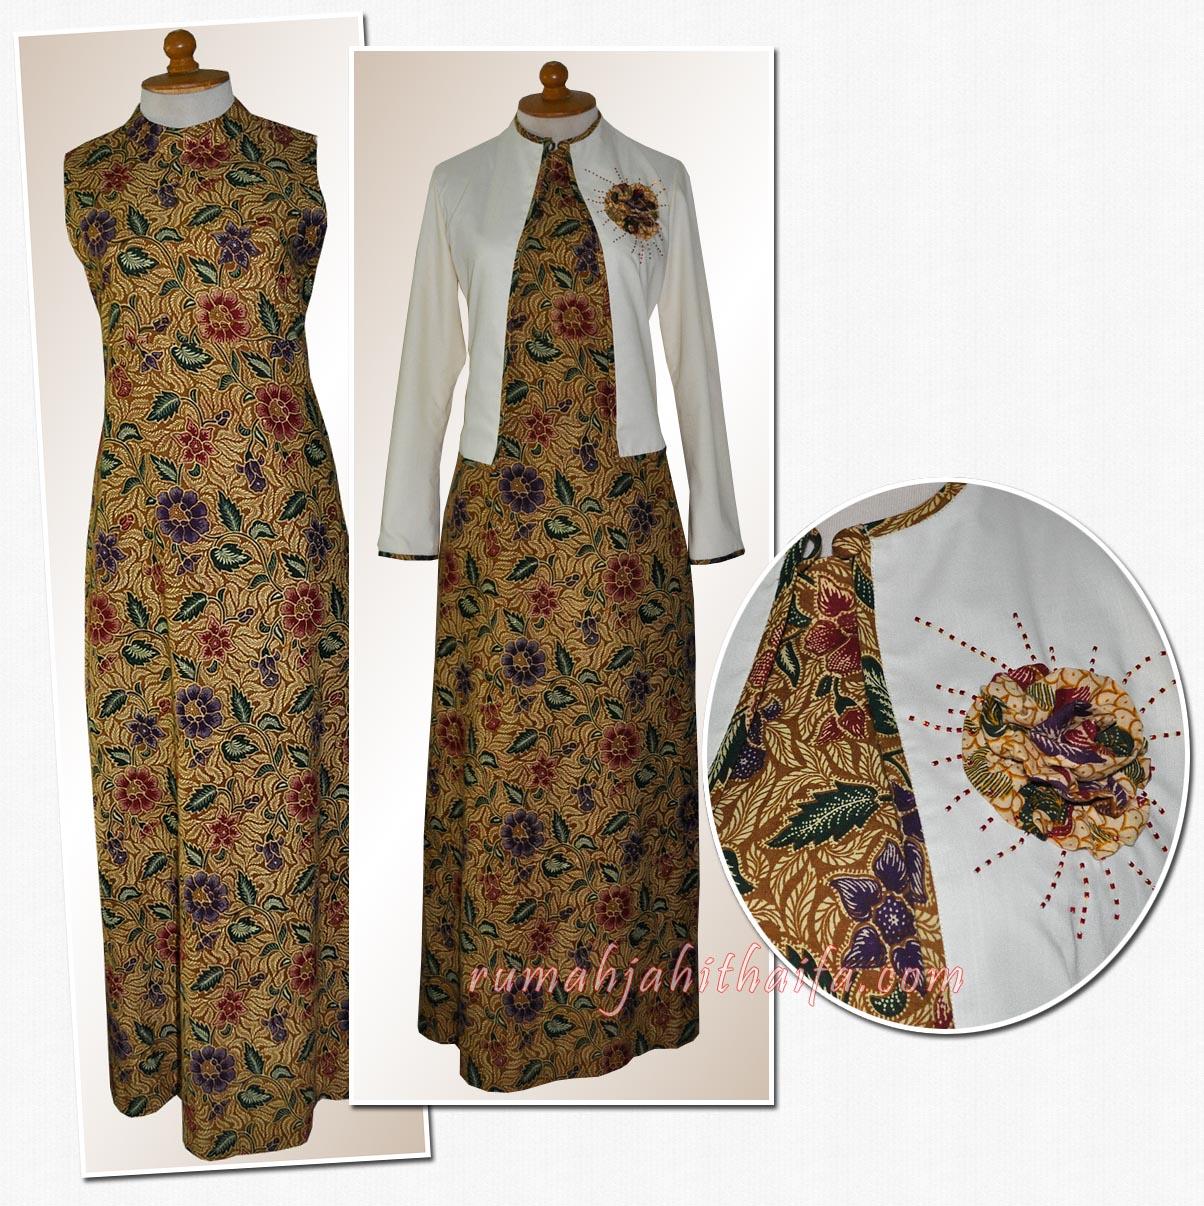 Blouse batik rumah jahit haifa Model baju gamis batik muslimah terbaru